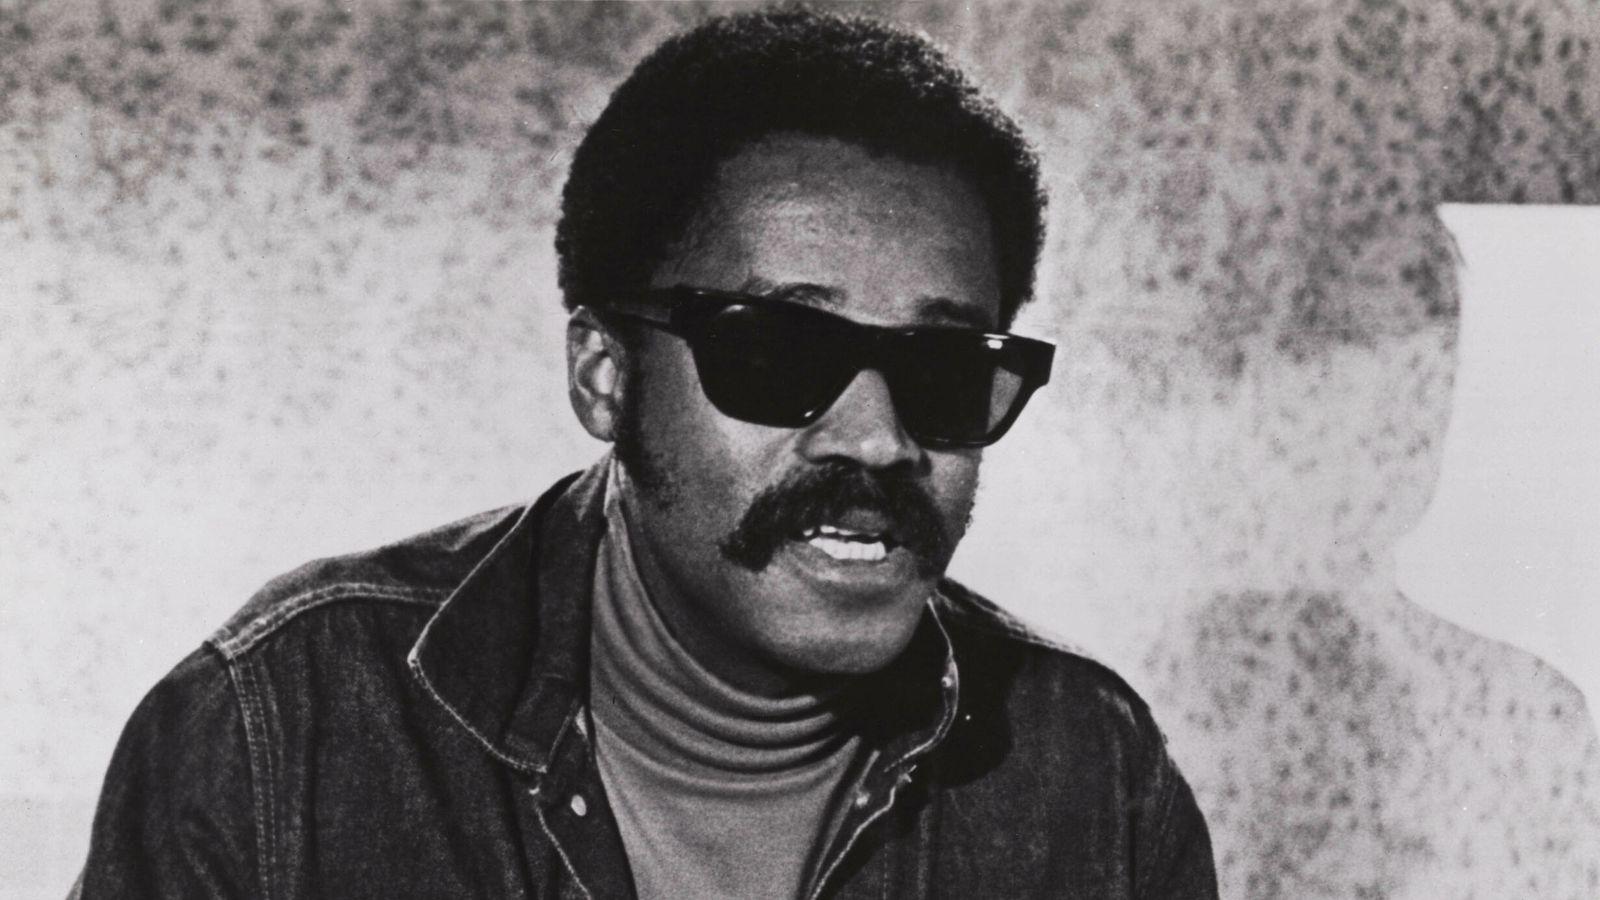 Melvin Van Peebles: Filmmaker dubbed the 'godfather of black cinema' dies aged 89